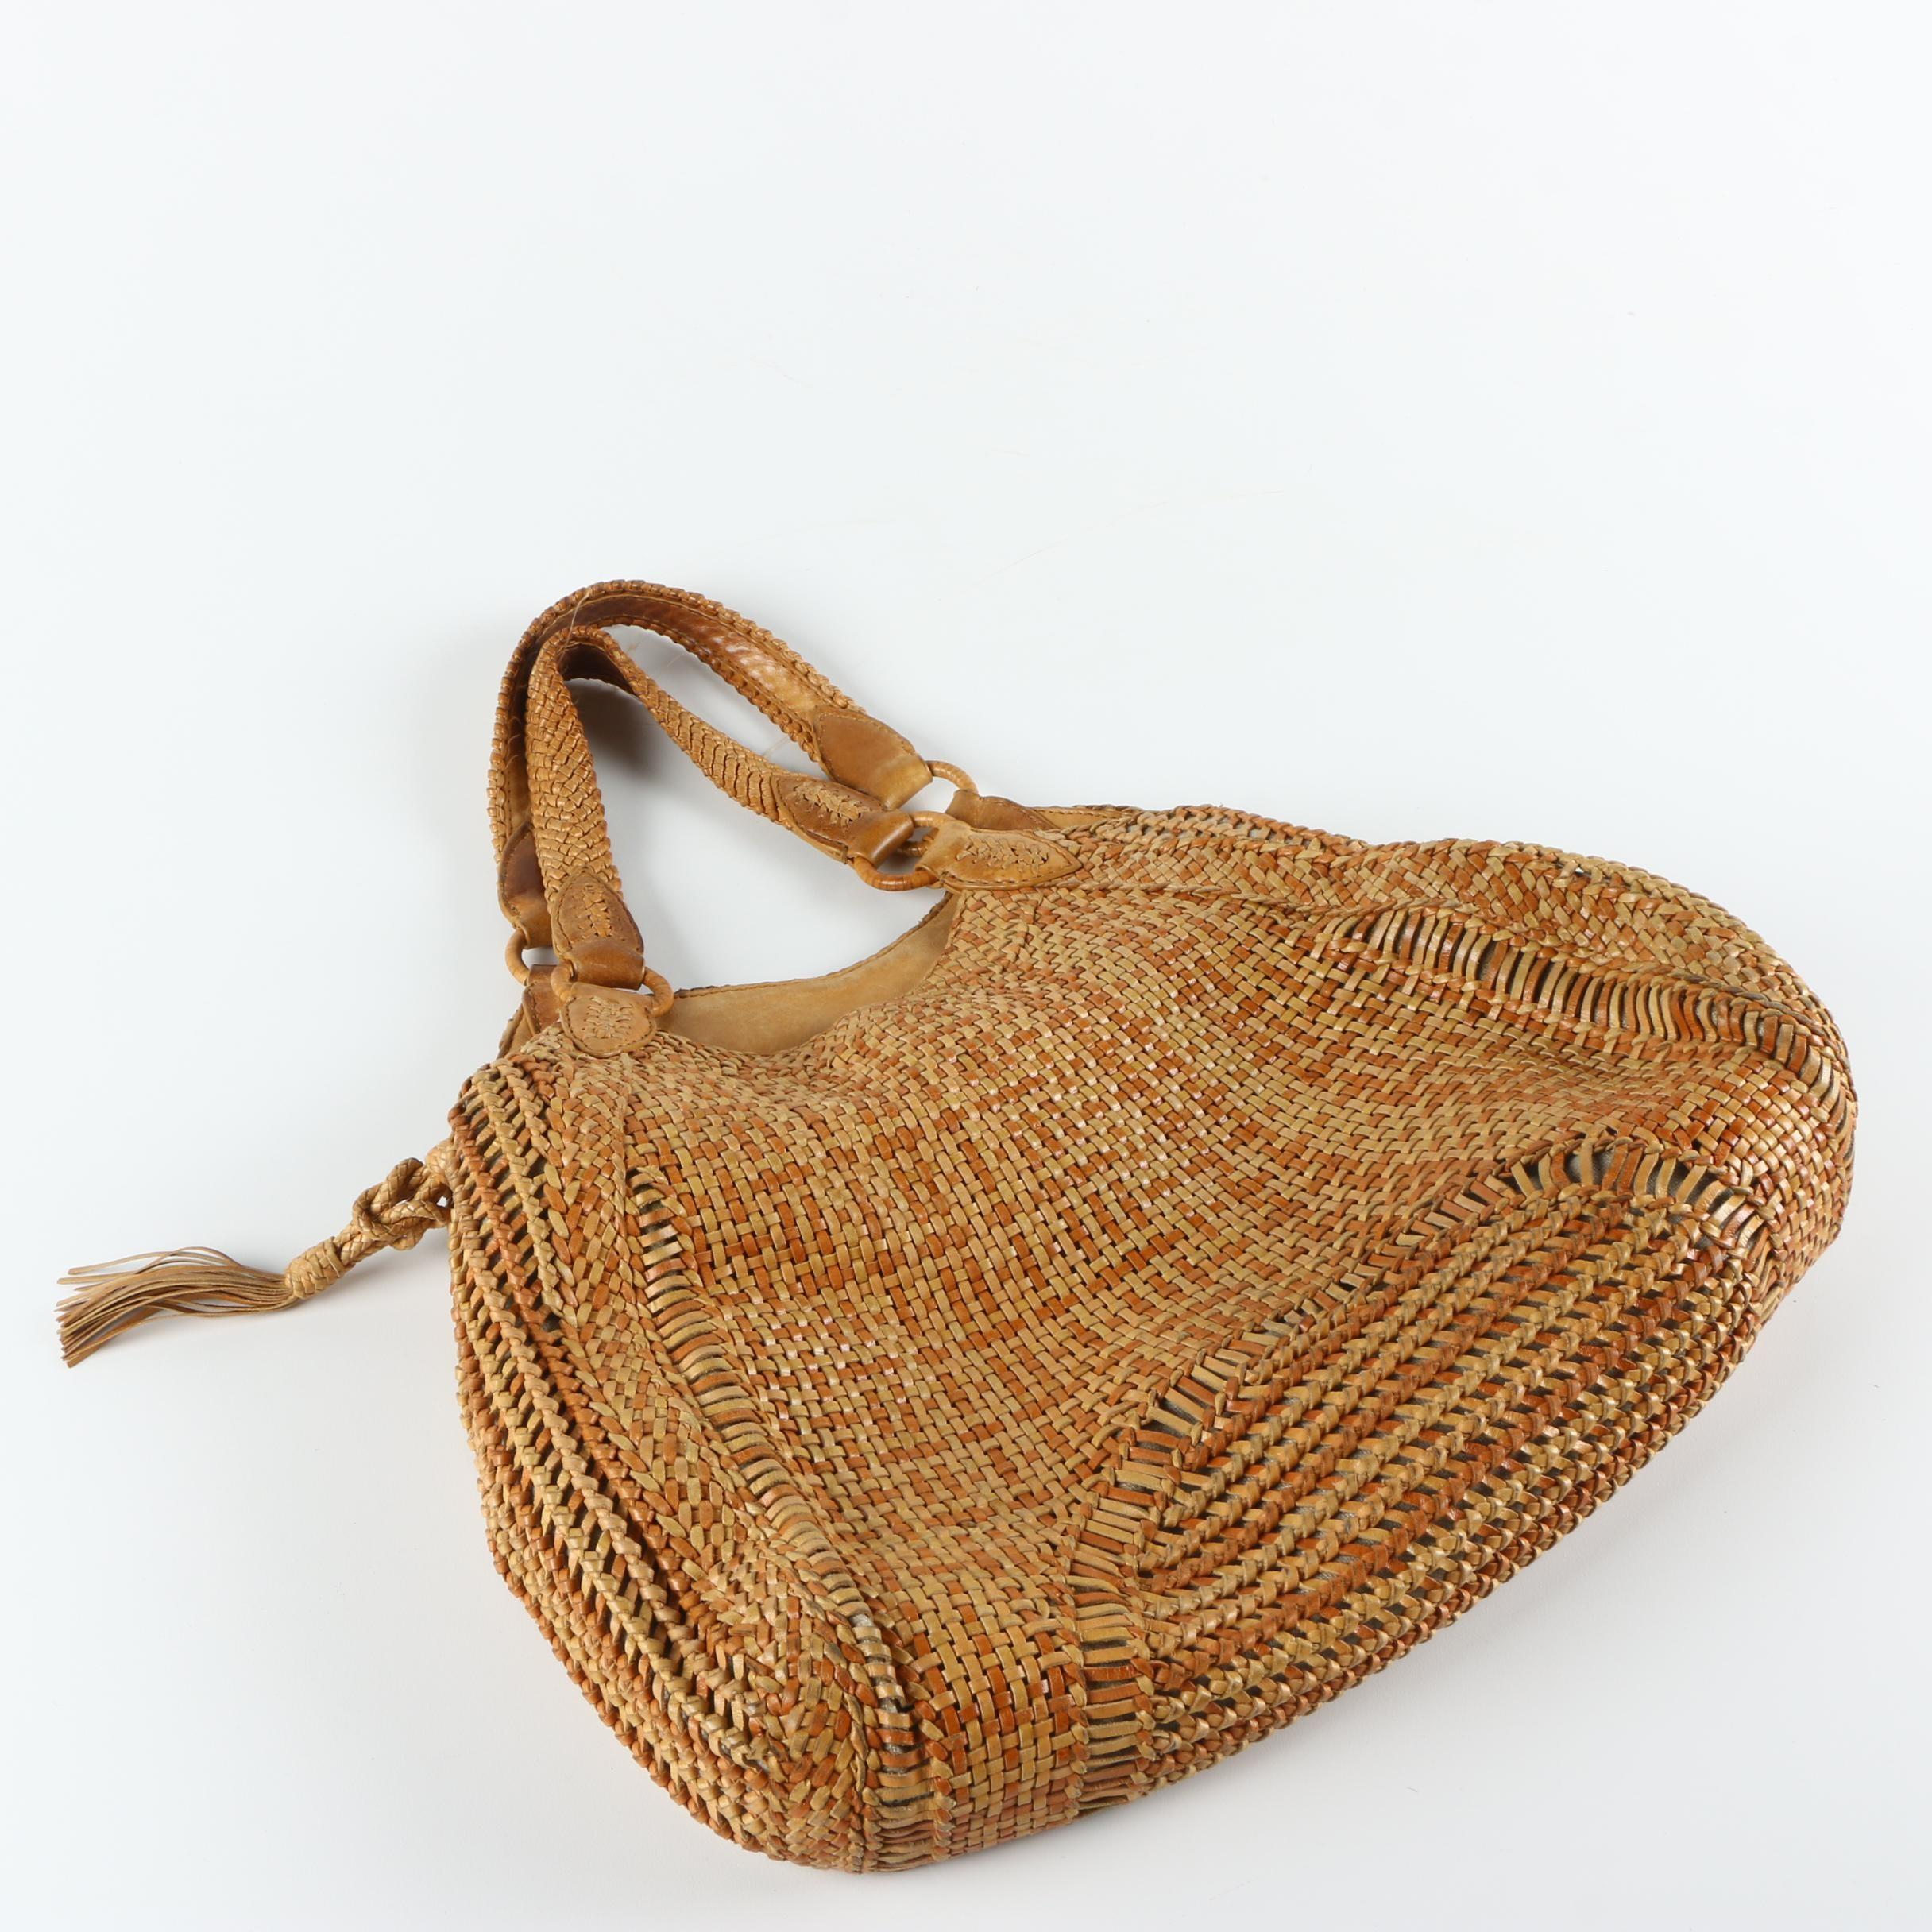 Cole Haan Woven Leather Handbag